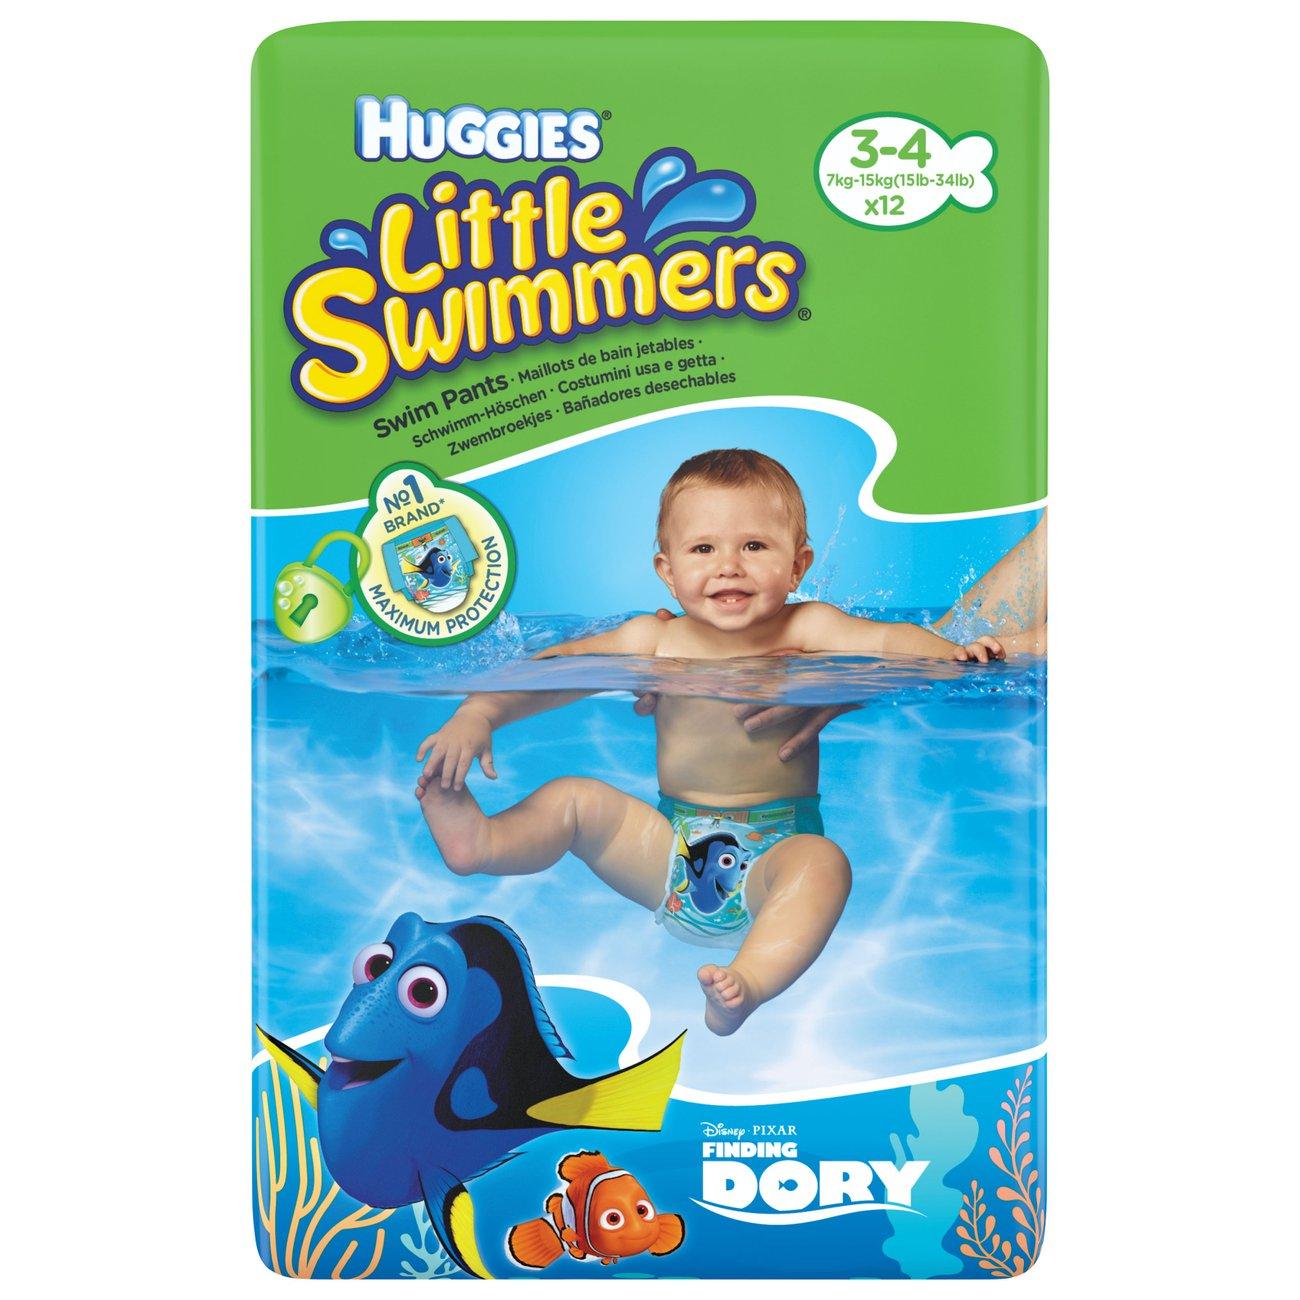 Couche Piscine Natation Adulte Huggies Huggies Little Swimmers 3-4 à Couche Piscine Jetable